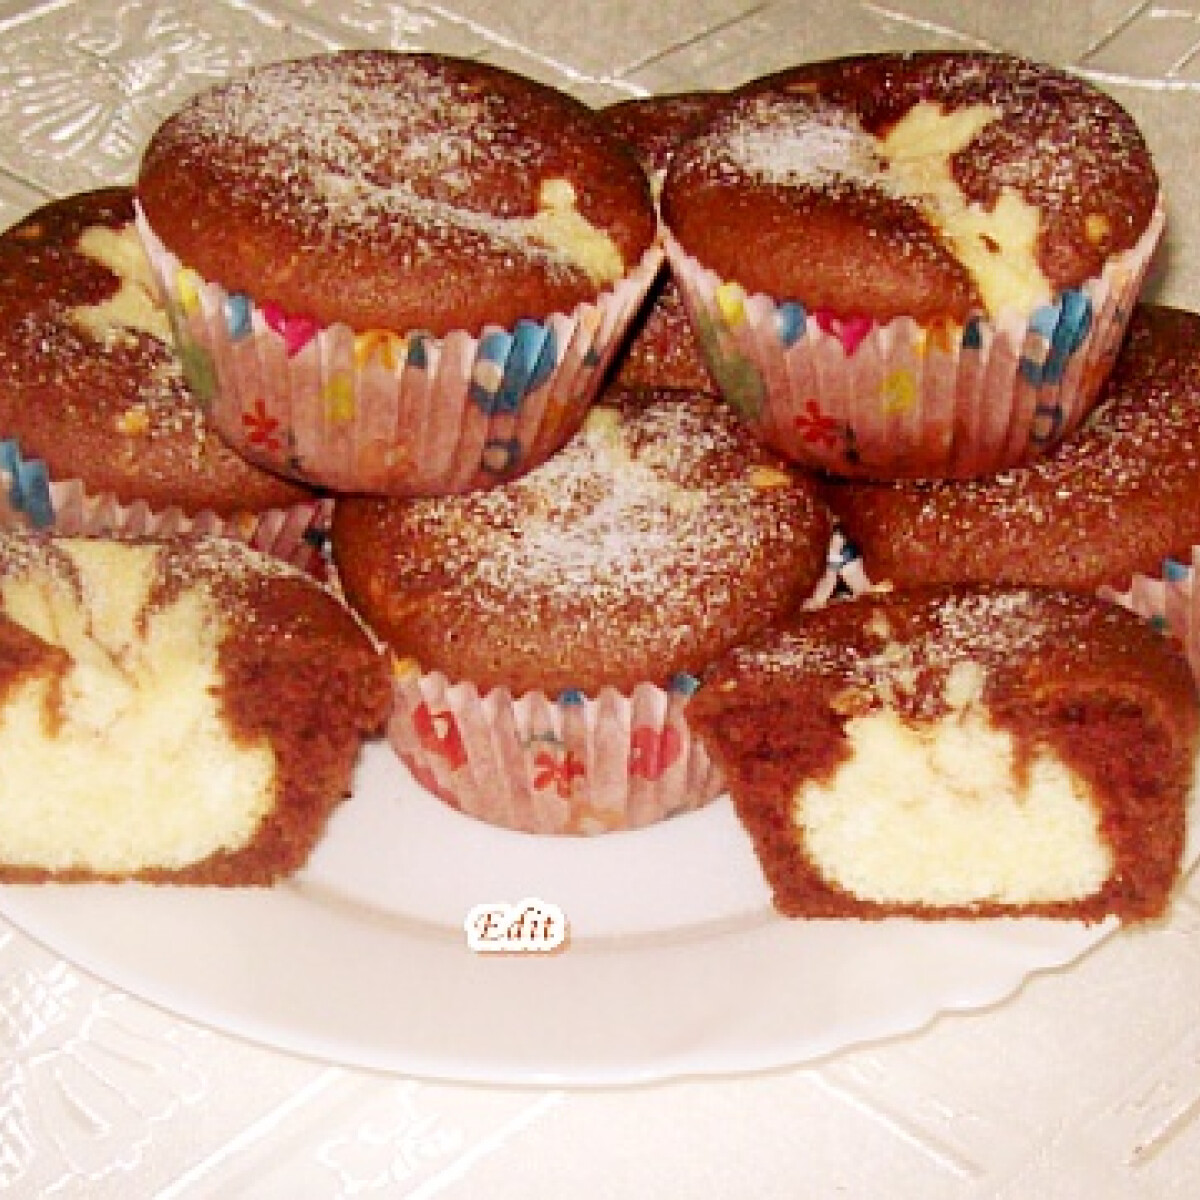 Ezen a képen: Bocimobil muffin formában